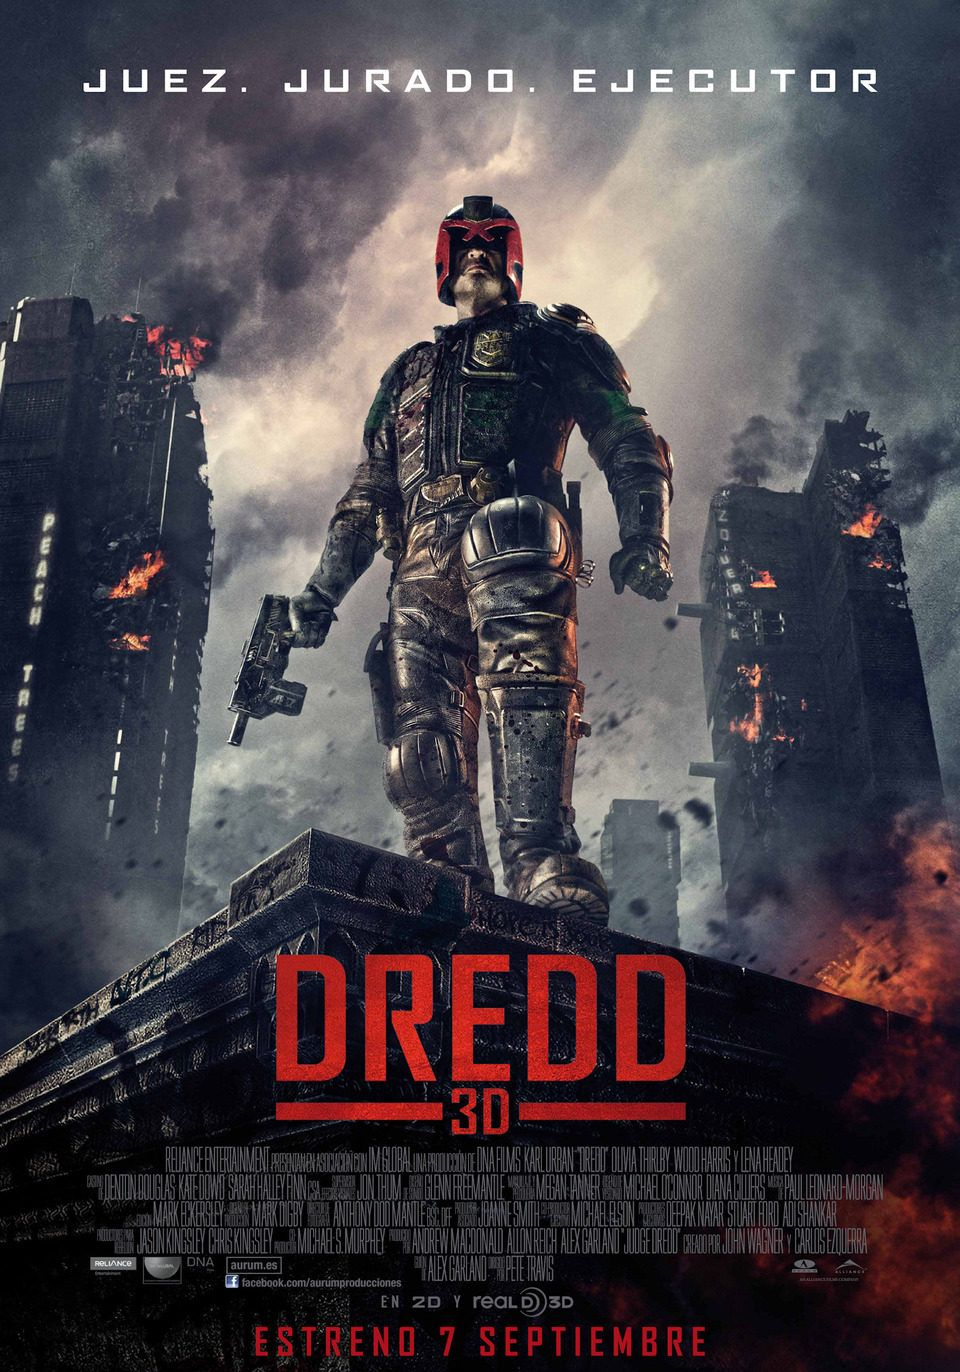 Dredd 2012 Dredd Pelicula Ver Peliculas Gratis Ver Peliculas Online